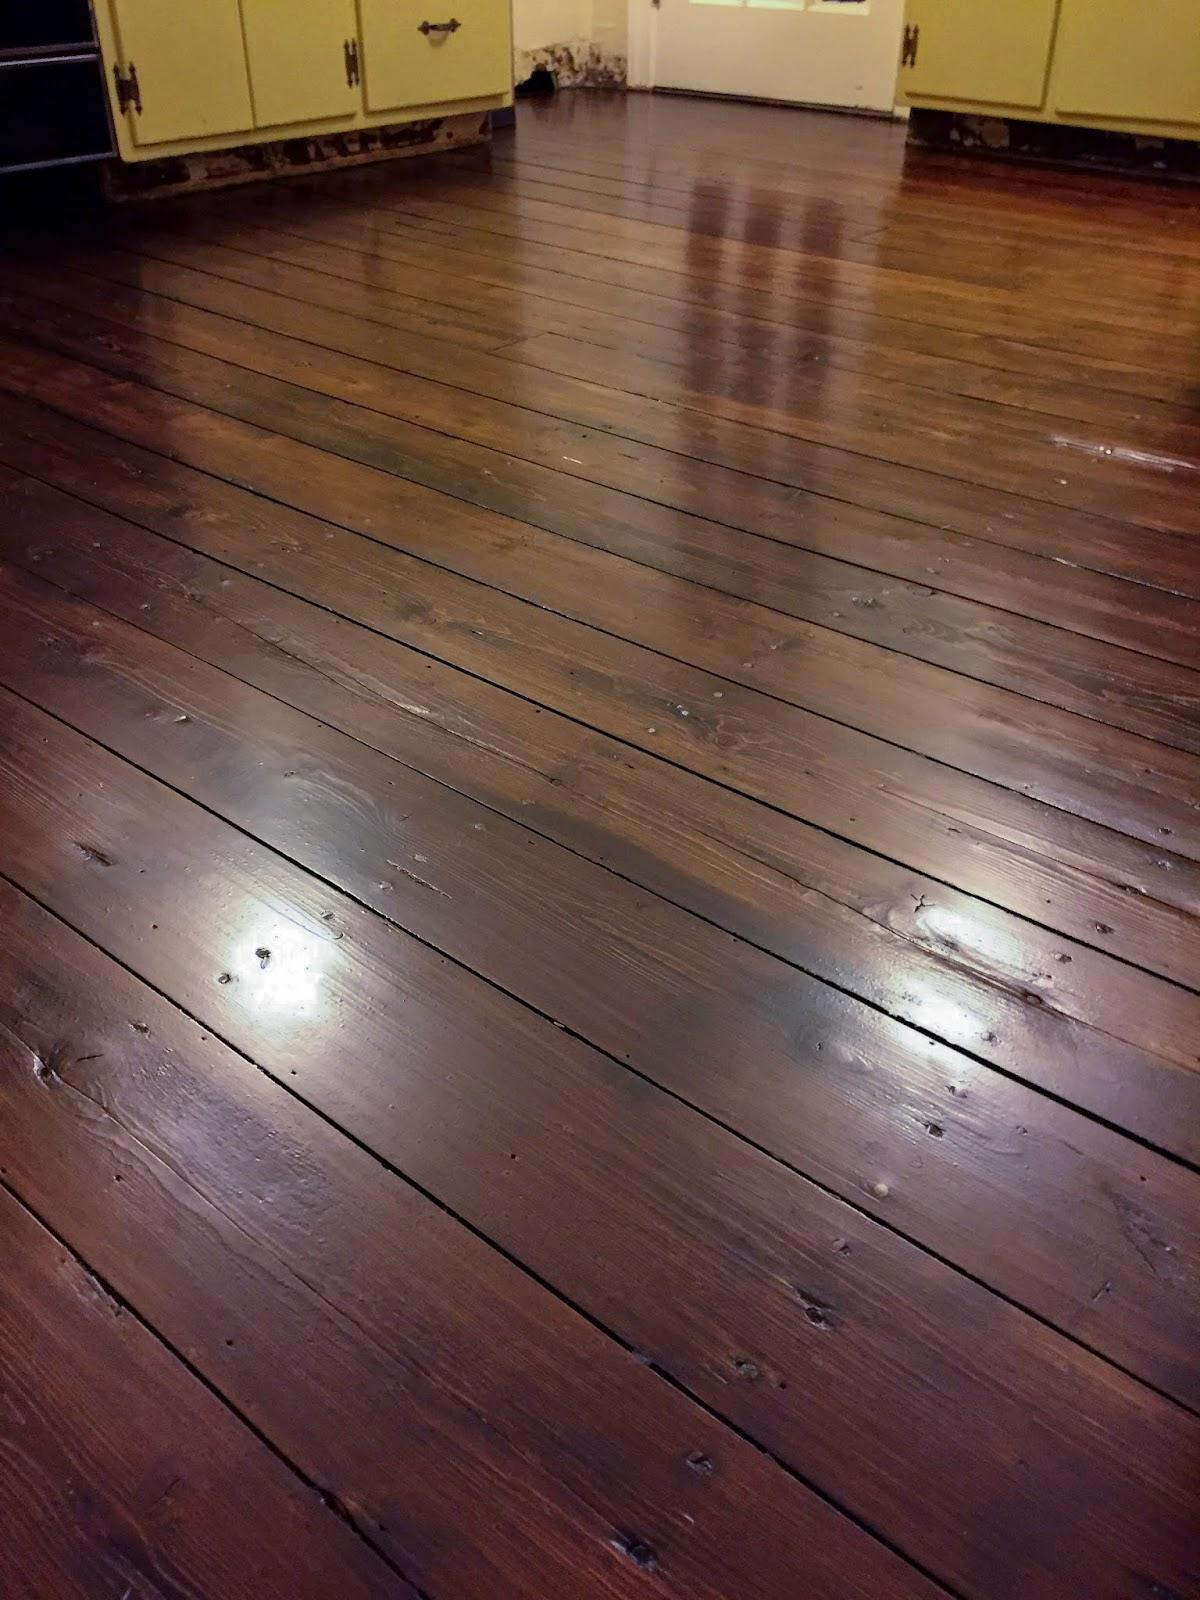 Refinishing Wood Floors - Wide Plank Pine - Restoring